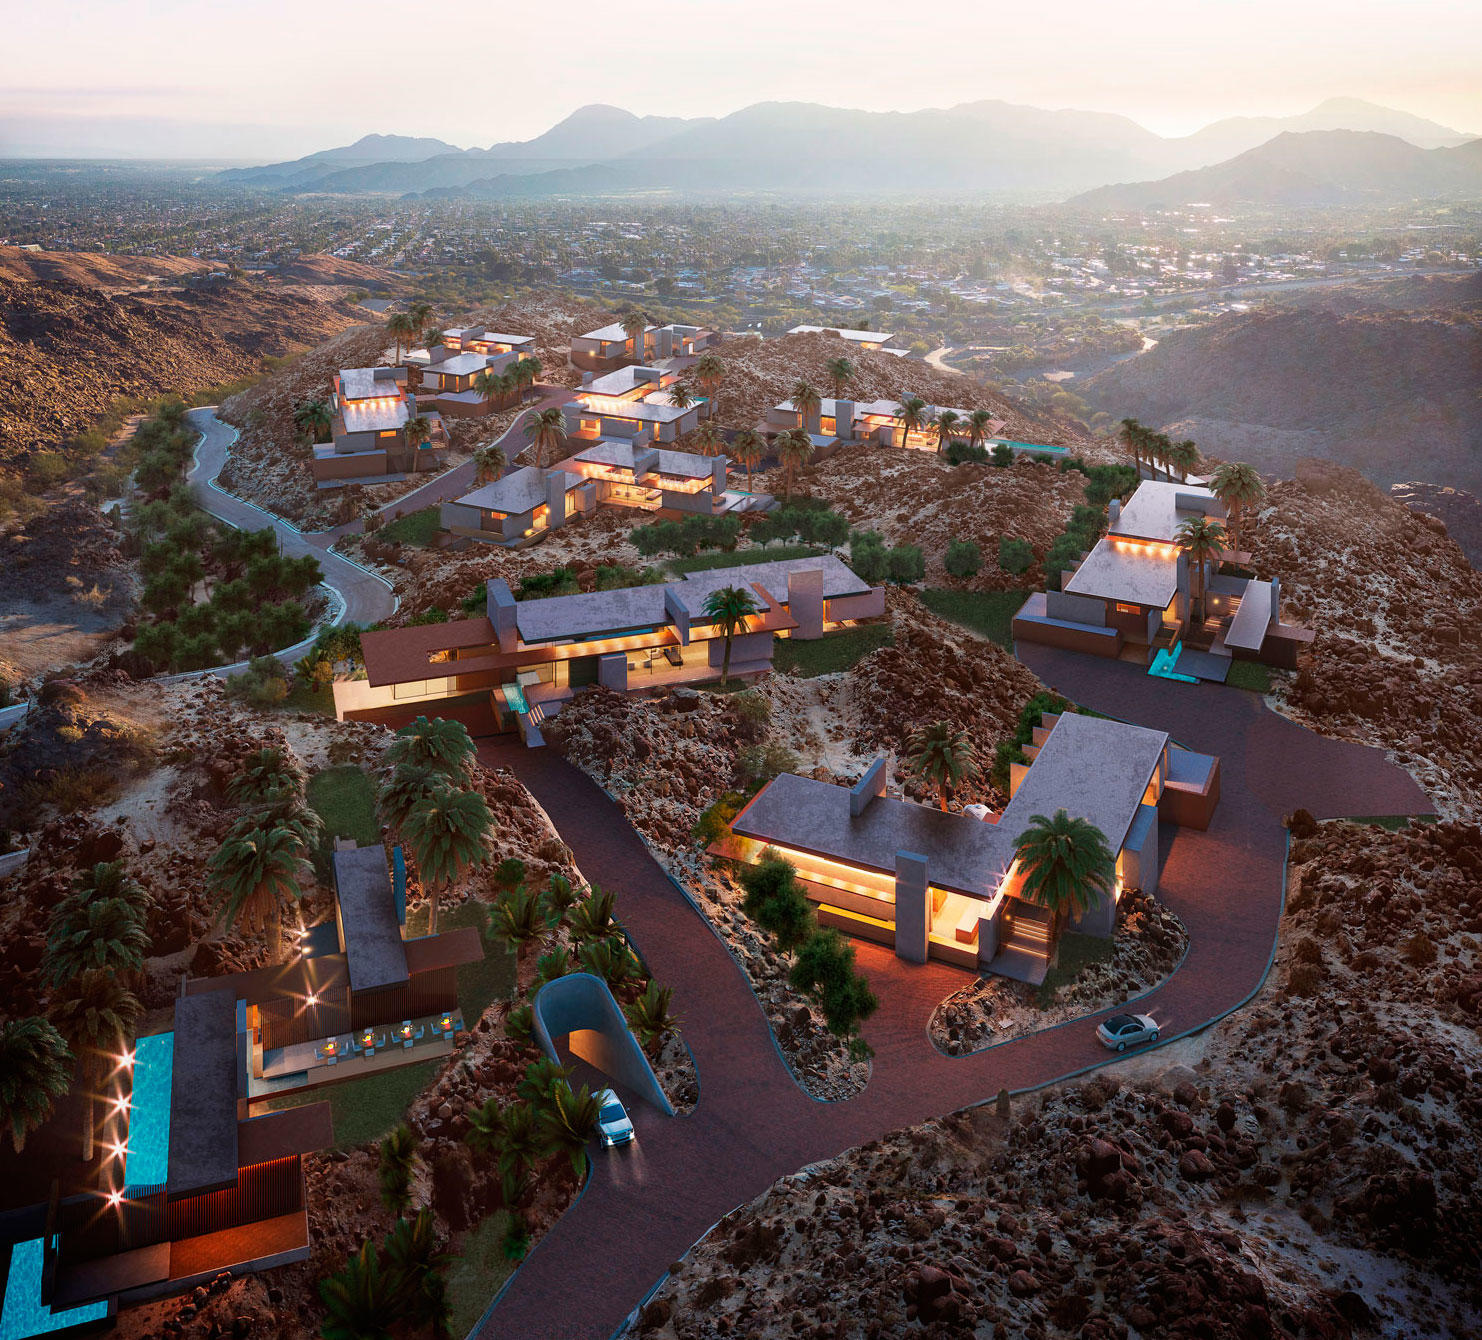 Photo of Lot 5 Nighthawk Estates, Palm Desert, CA 92260